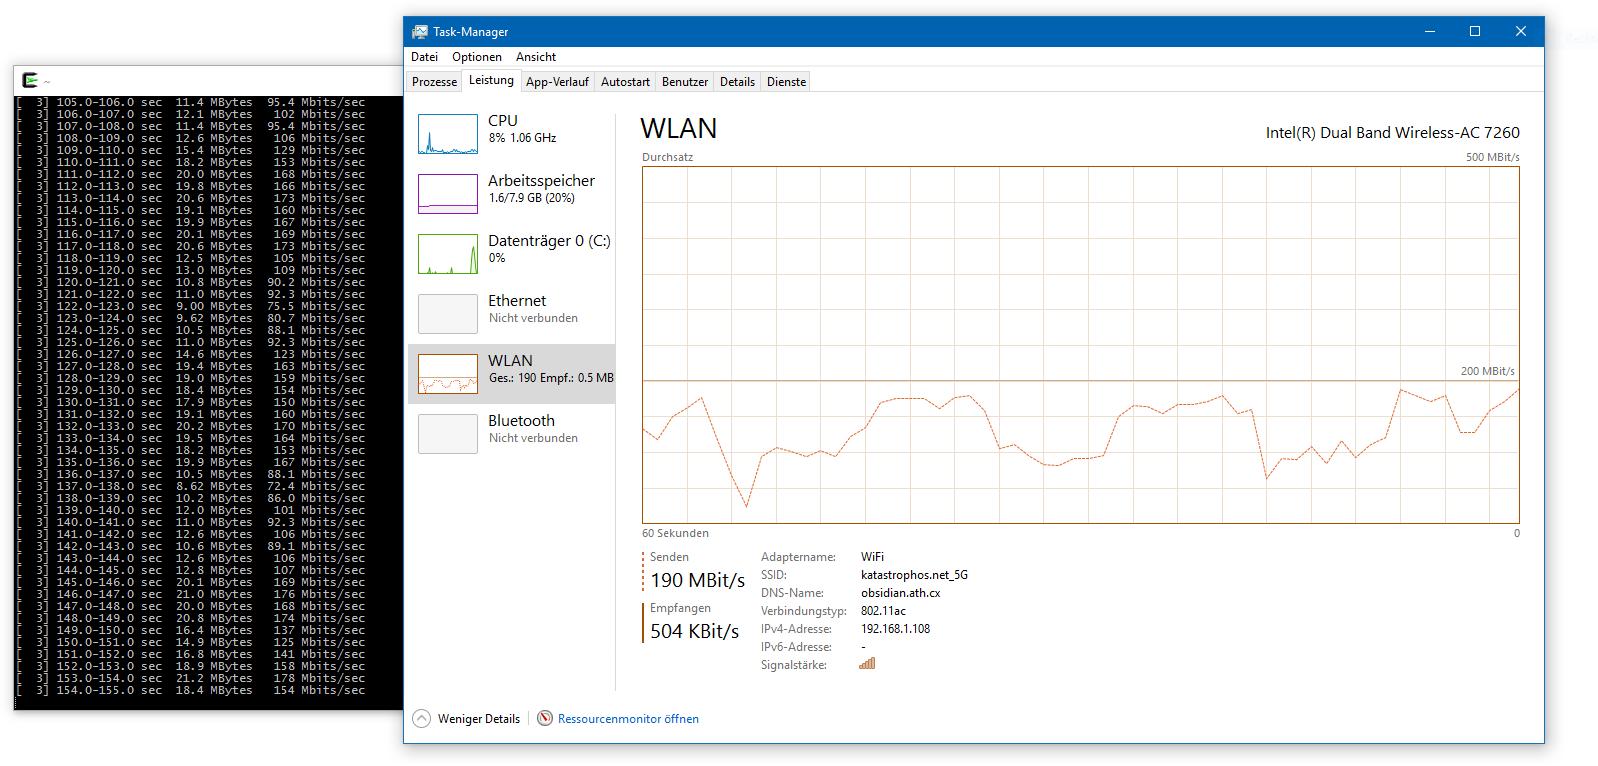 Windows 10 TH2 Wifi/WLAN AutoConfig scan bug - Katastrophos net Blog